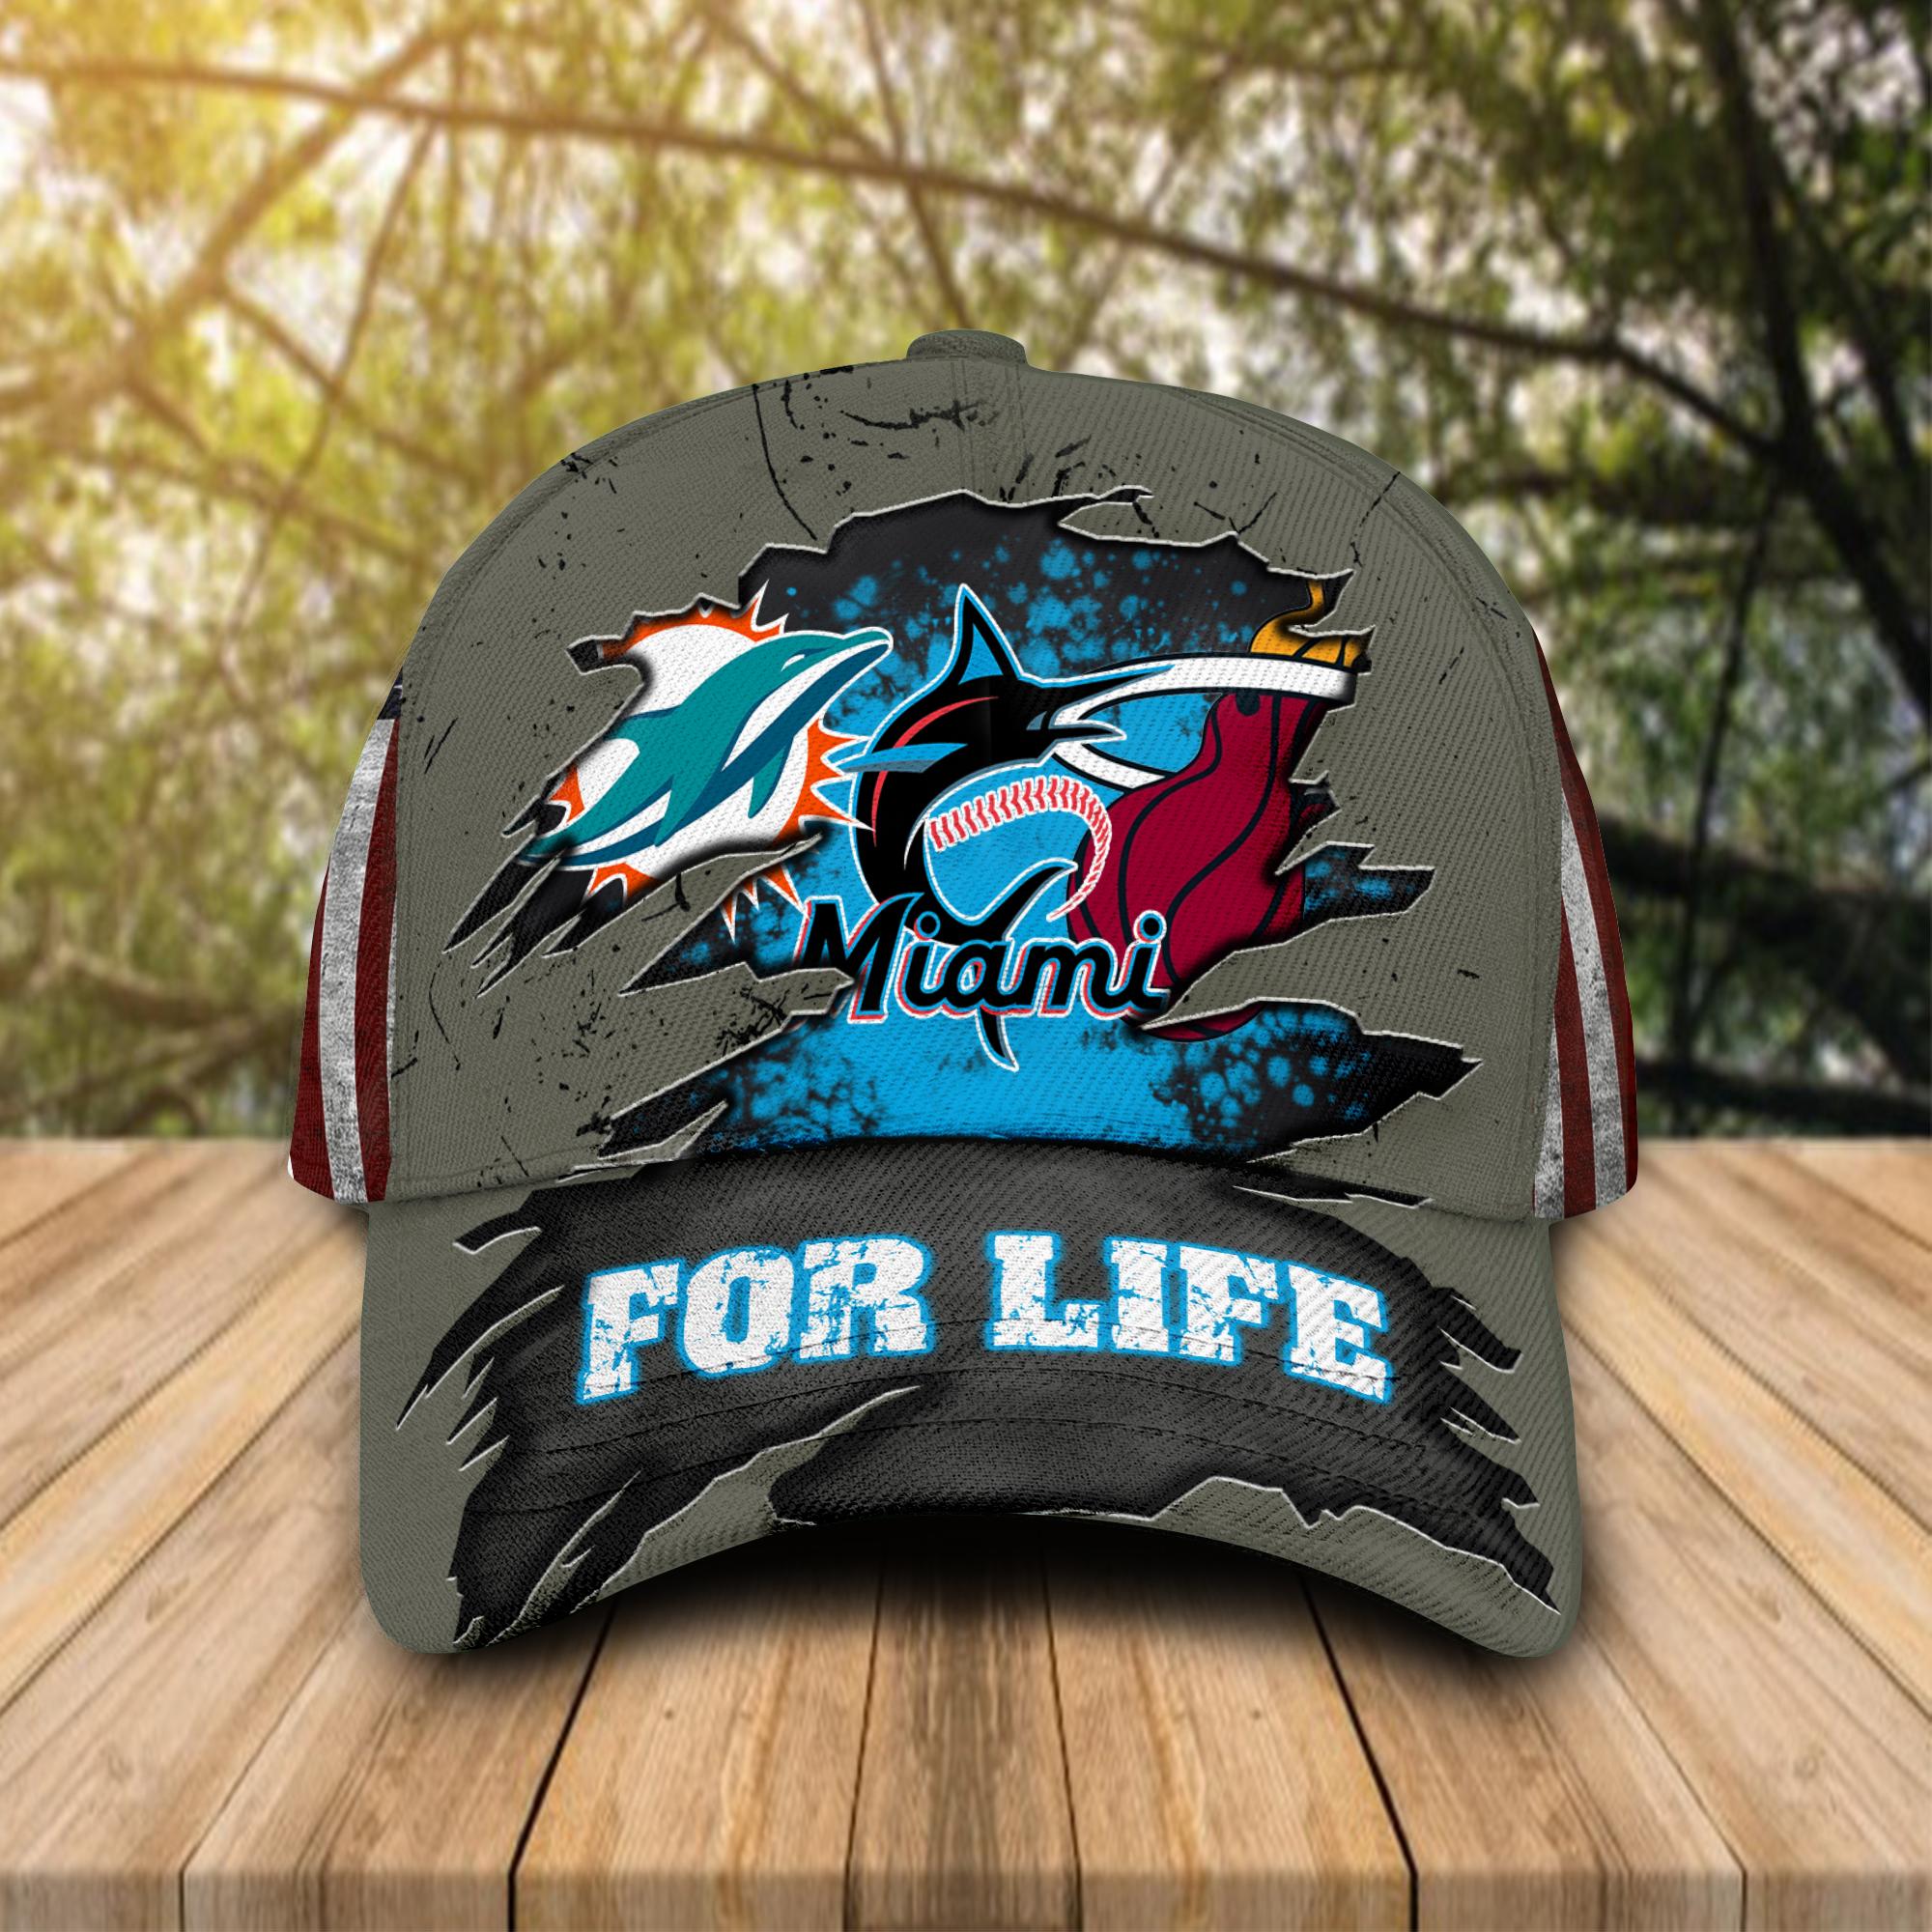 Miami Dolphins, Miami Marlins, Miami Heat For Life Hat Cap